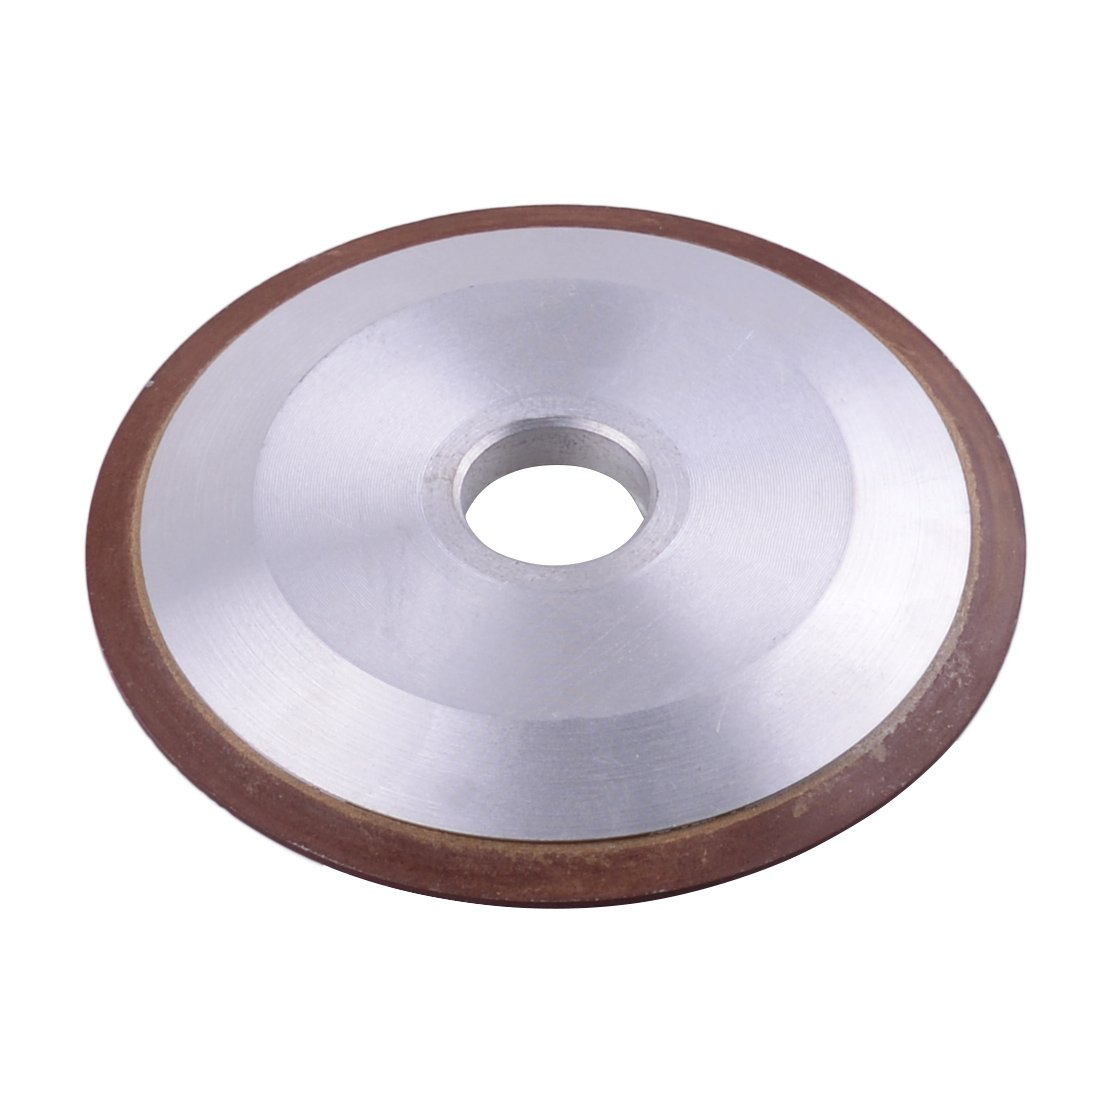 LETAOSK 100mm 4'' Diamond Grinder Carbide Metal Cutter Grinding Wheel Disc 150 Grit